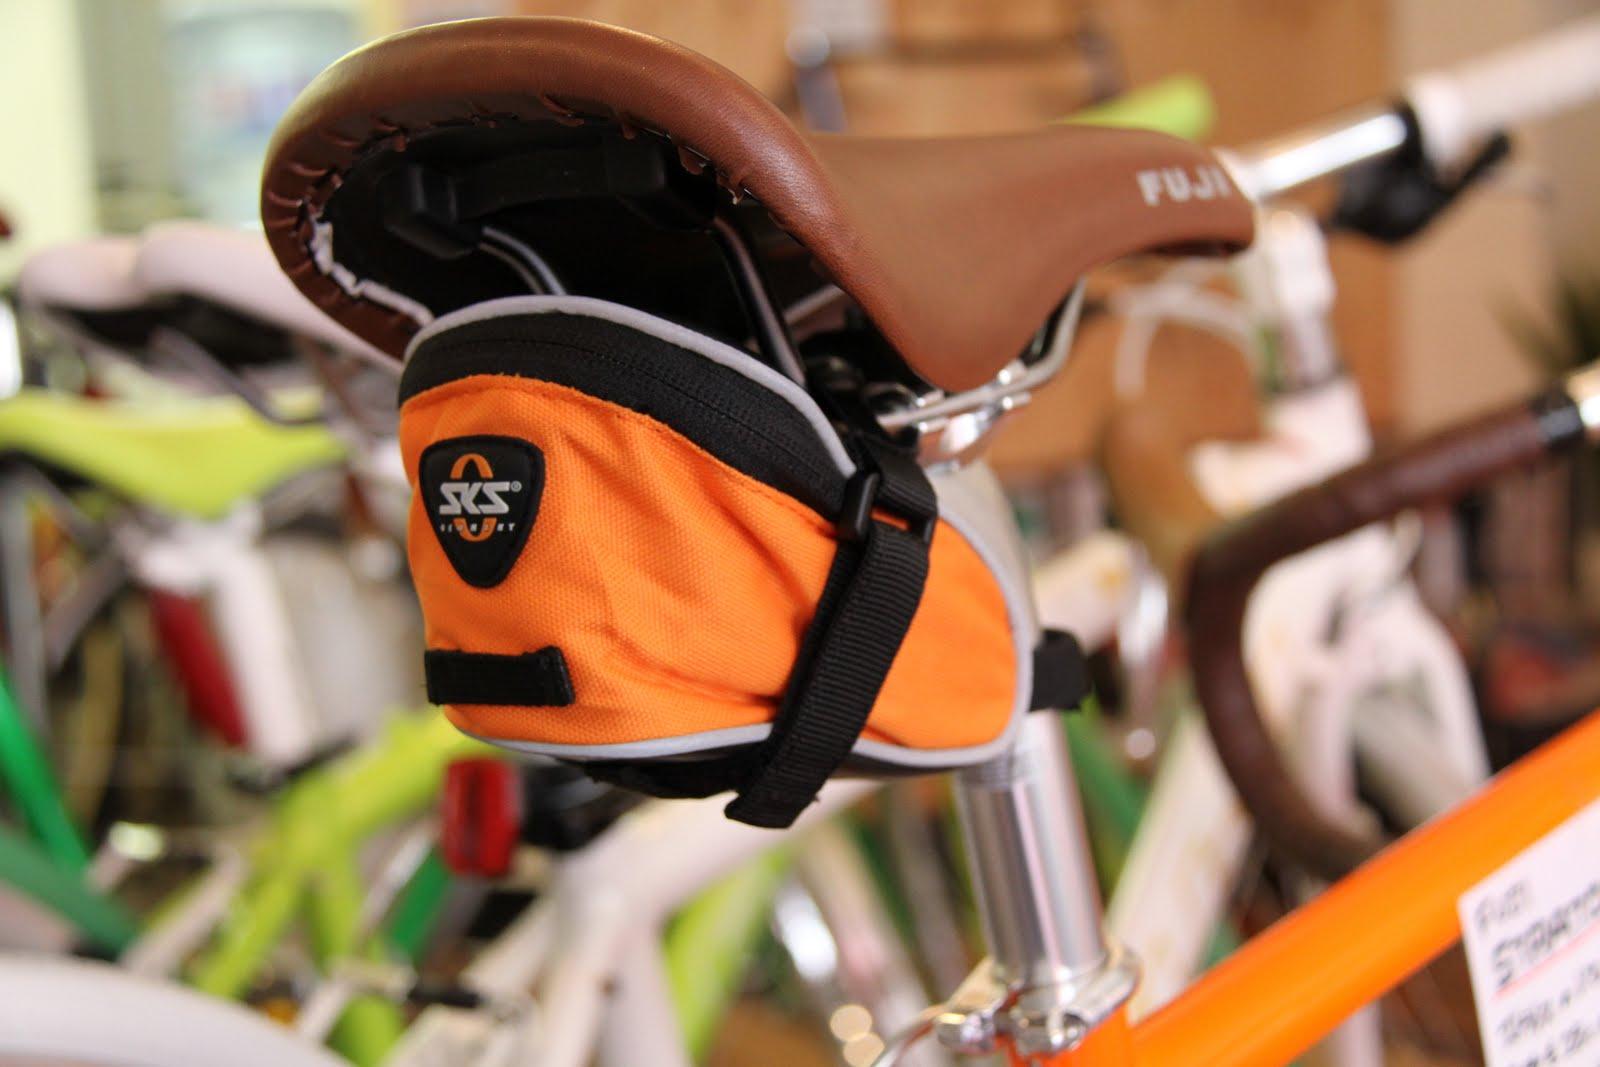 BICYCLE STUDIO MOVEMENT BLOG